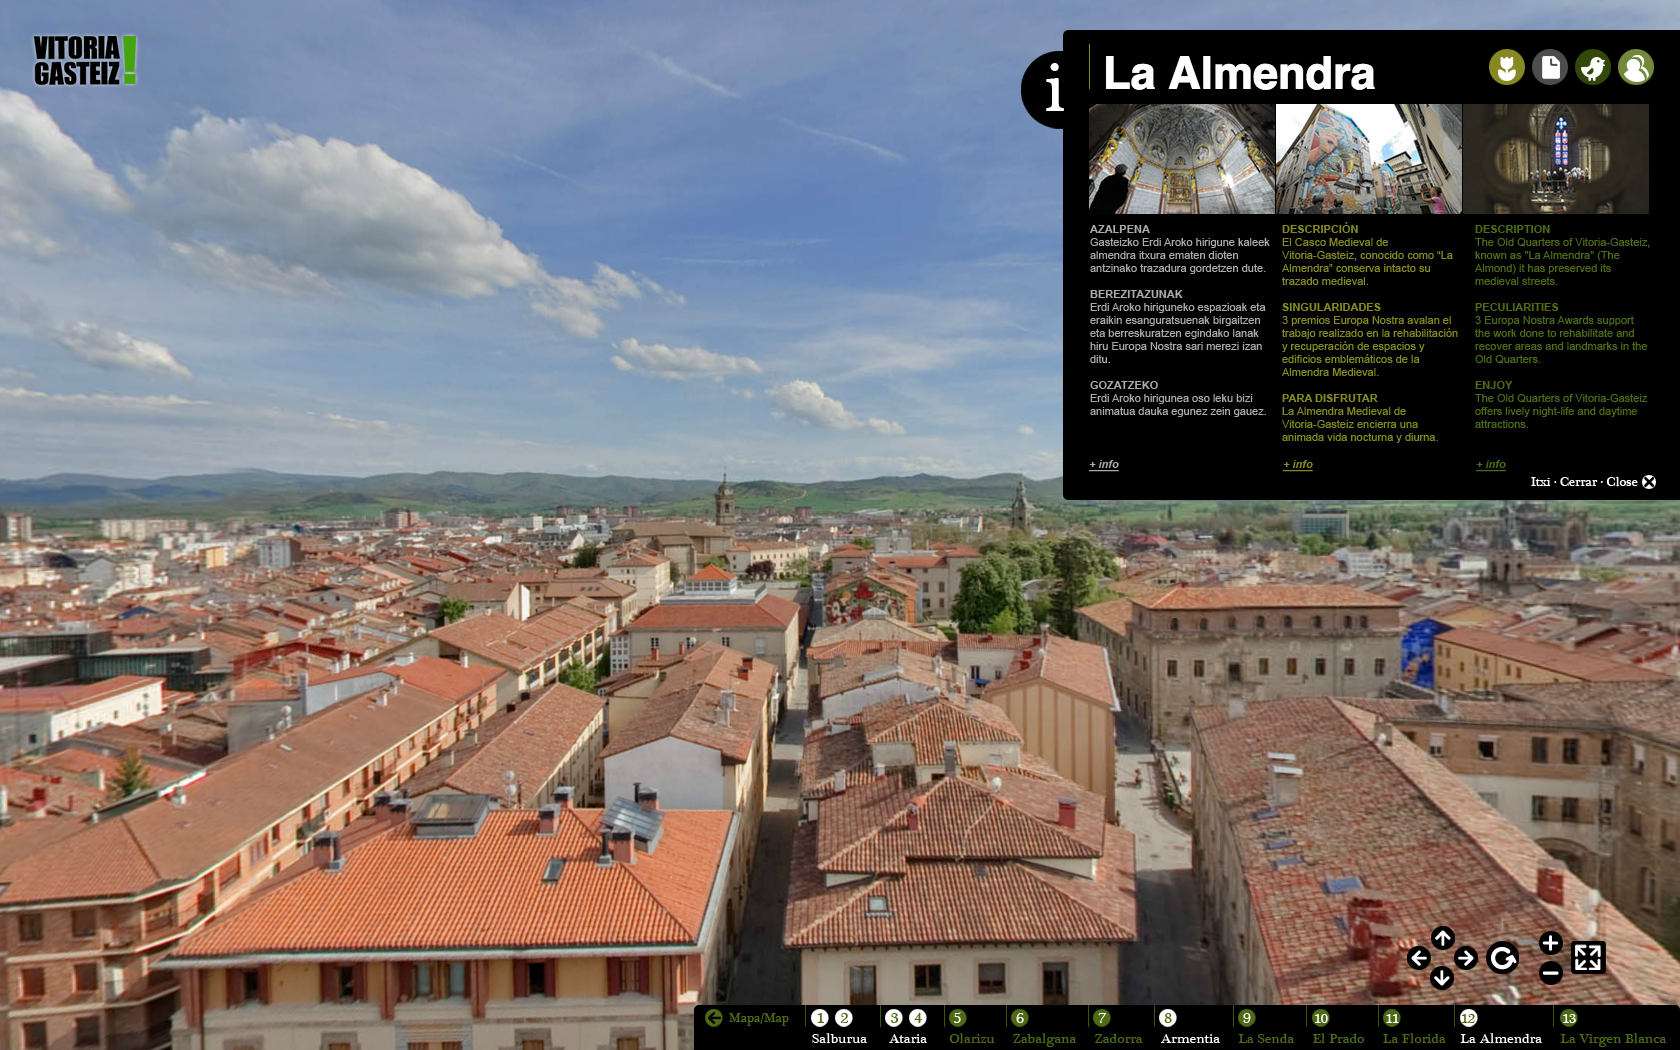 Fotografía panorámica 360º del Casco Medieval de Vitoria en la Visita Virtual - Vitoria-Gasteiz, Green Capital 2012